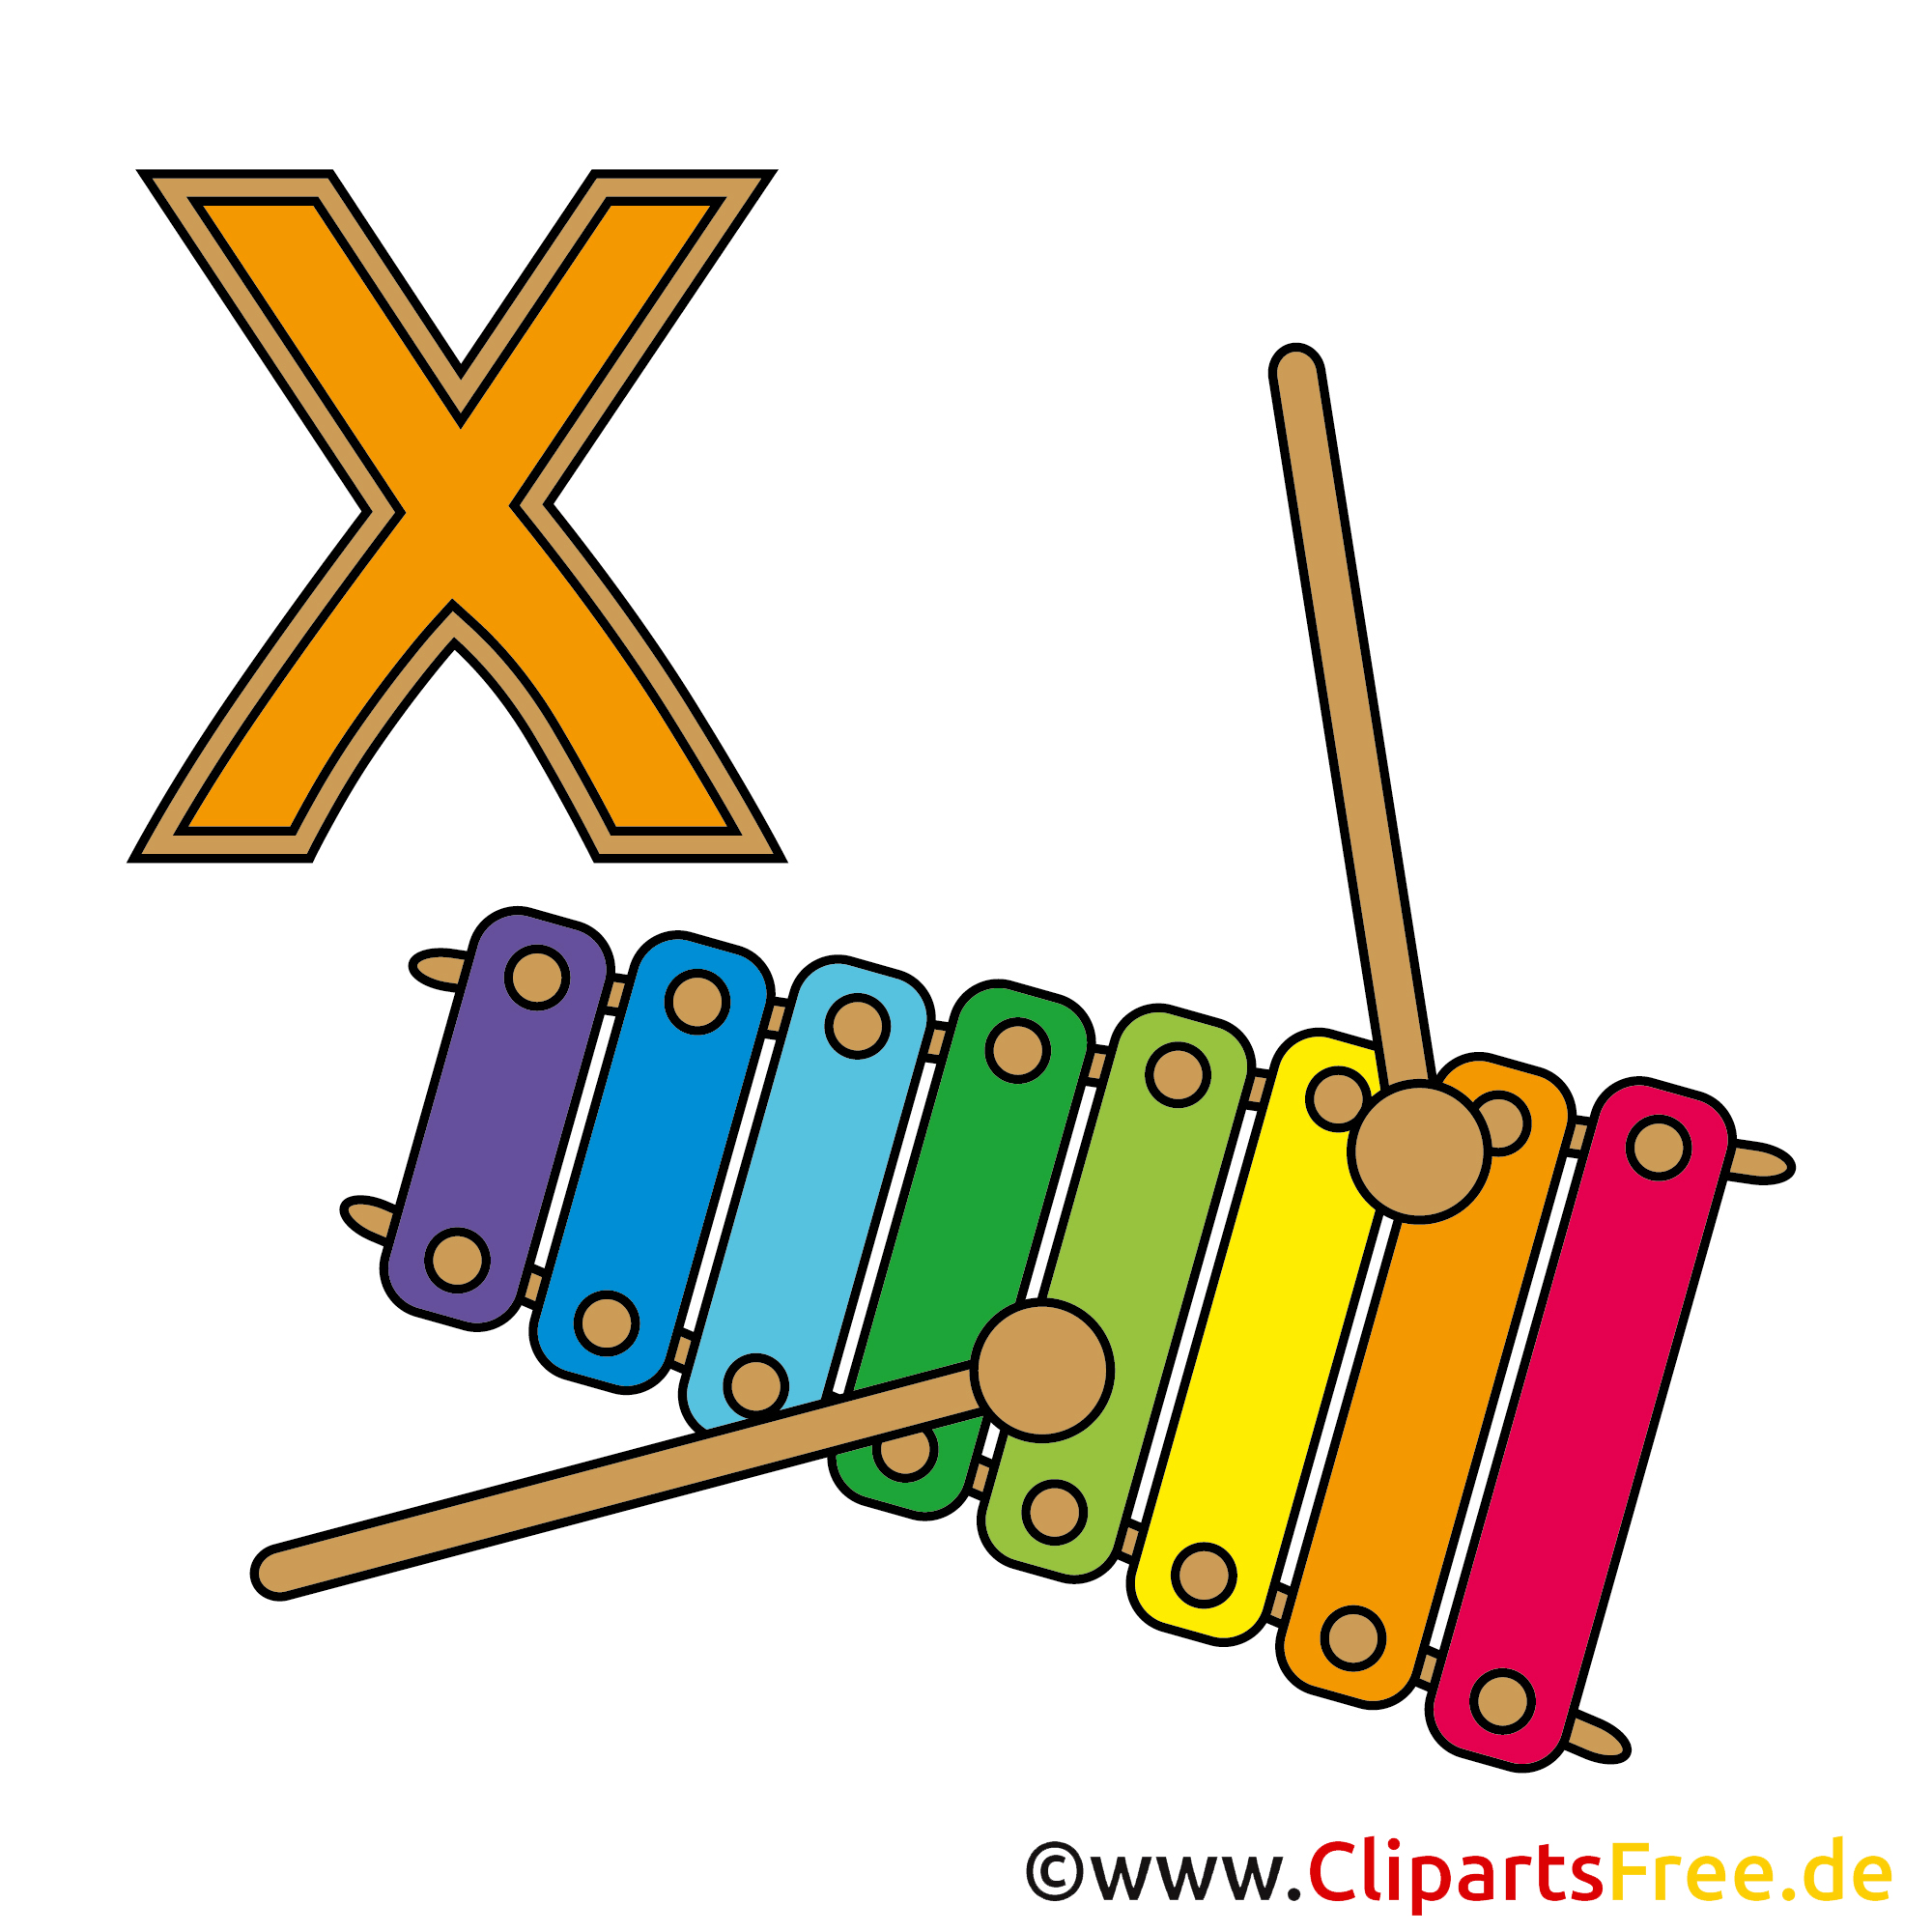 Wörterbuch - Xylophon Bild